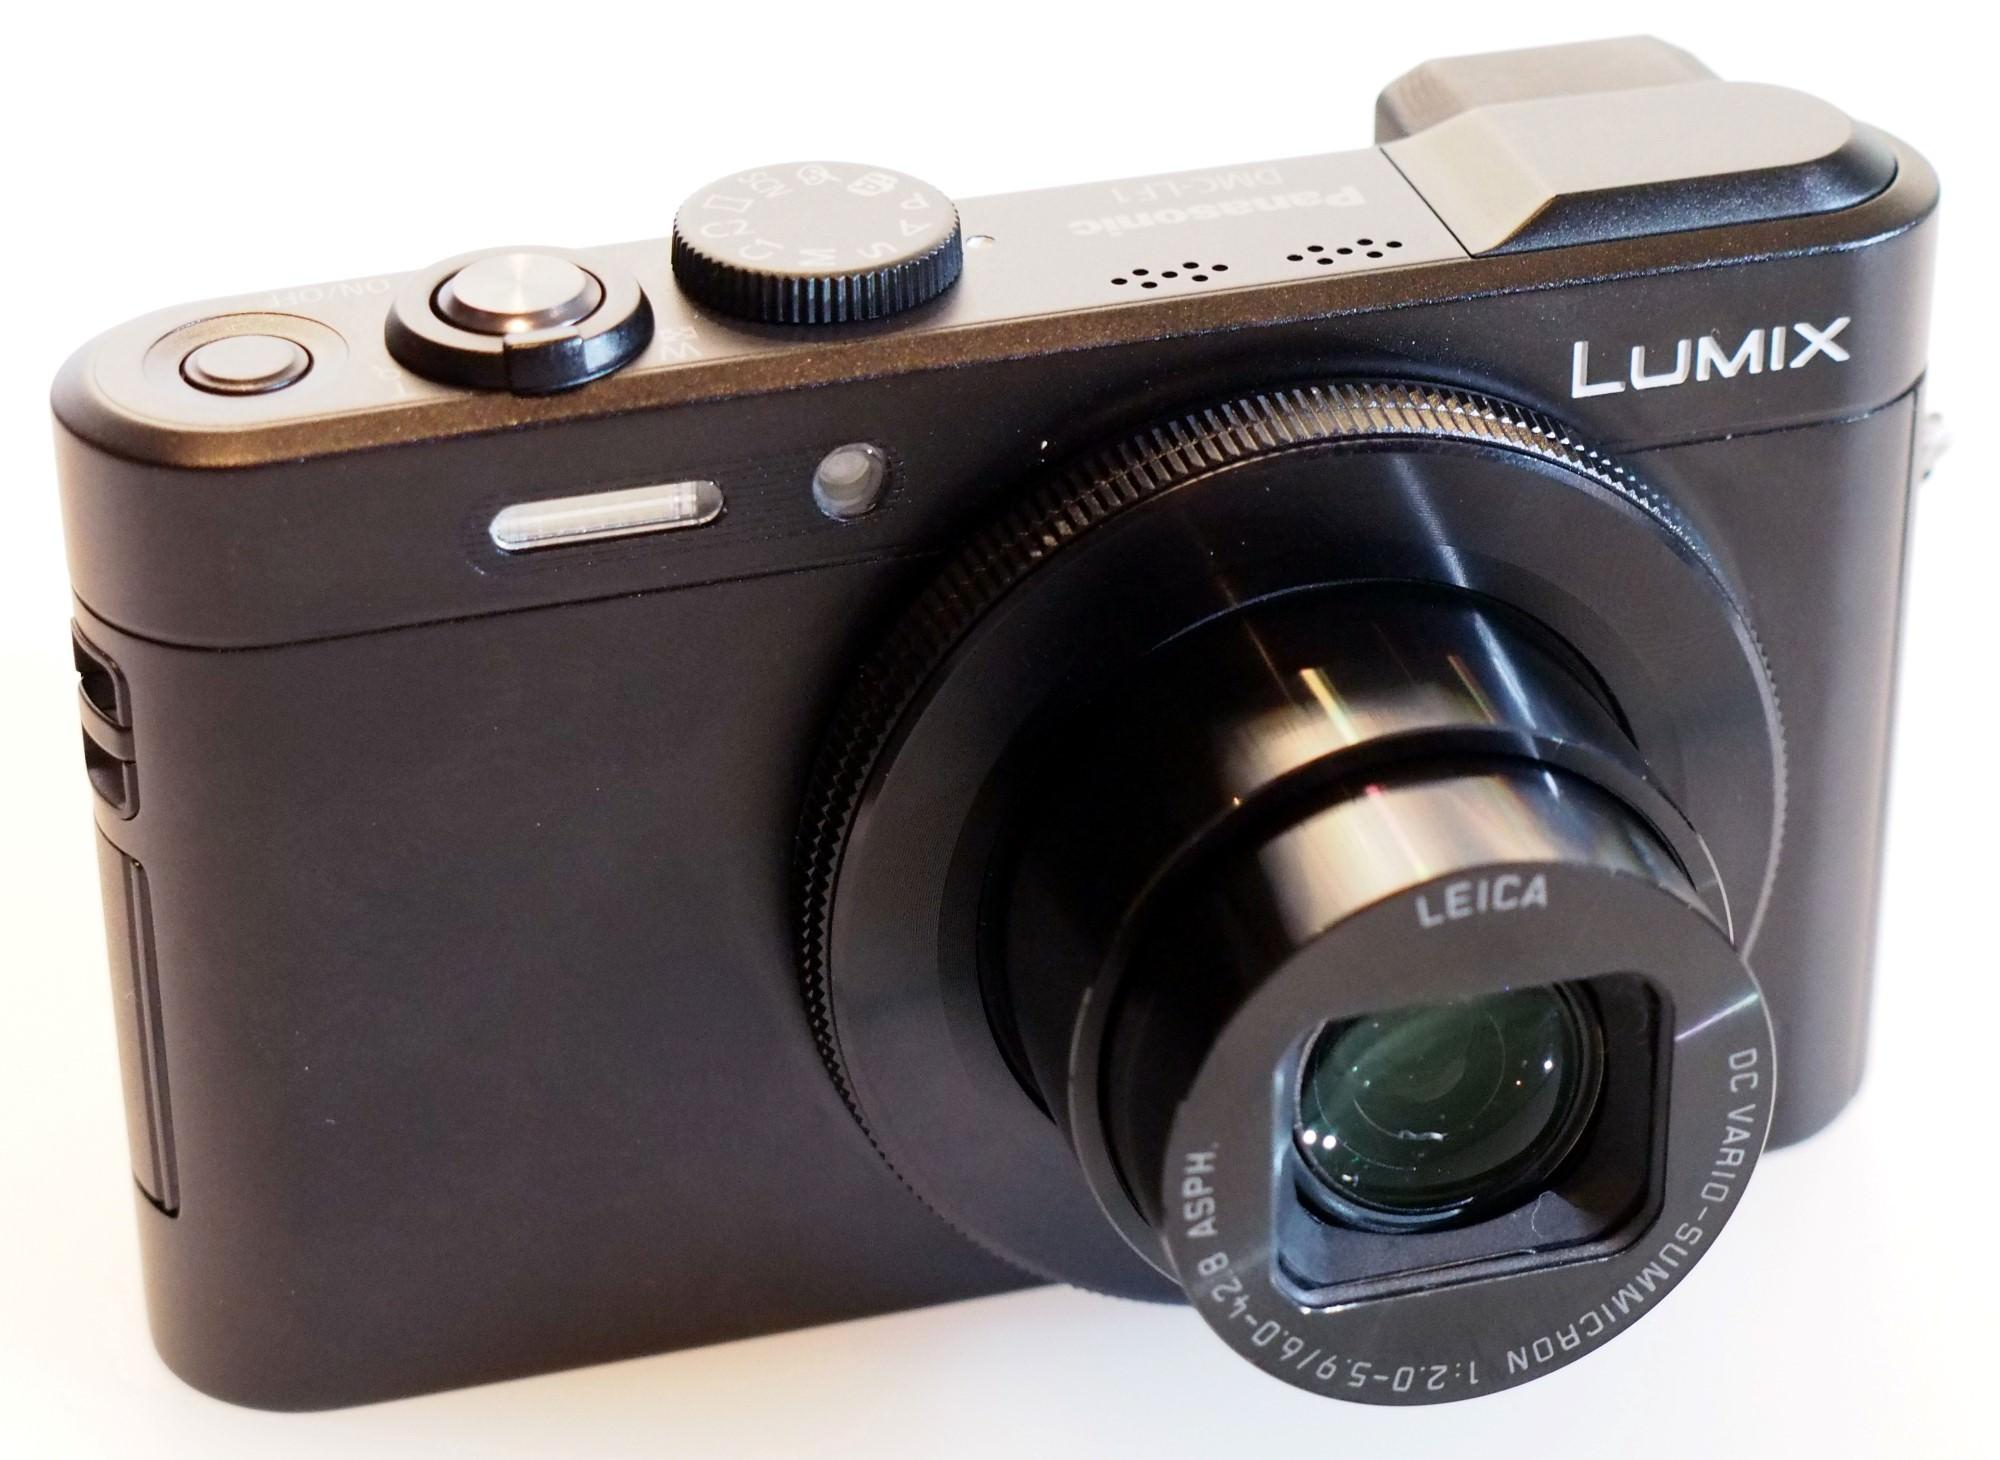 Panasonic Lumix LF1 Camera 4 Custom